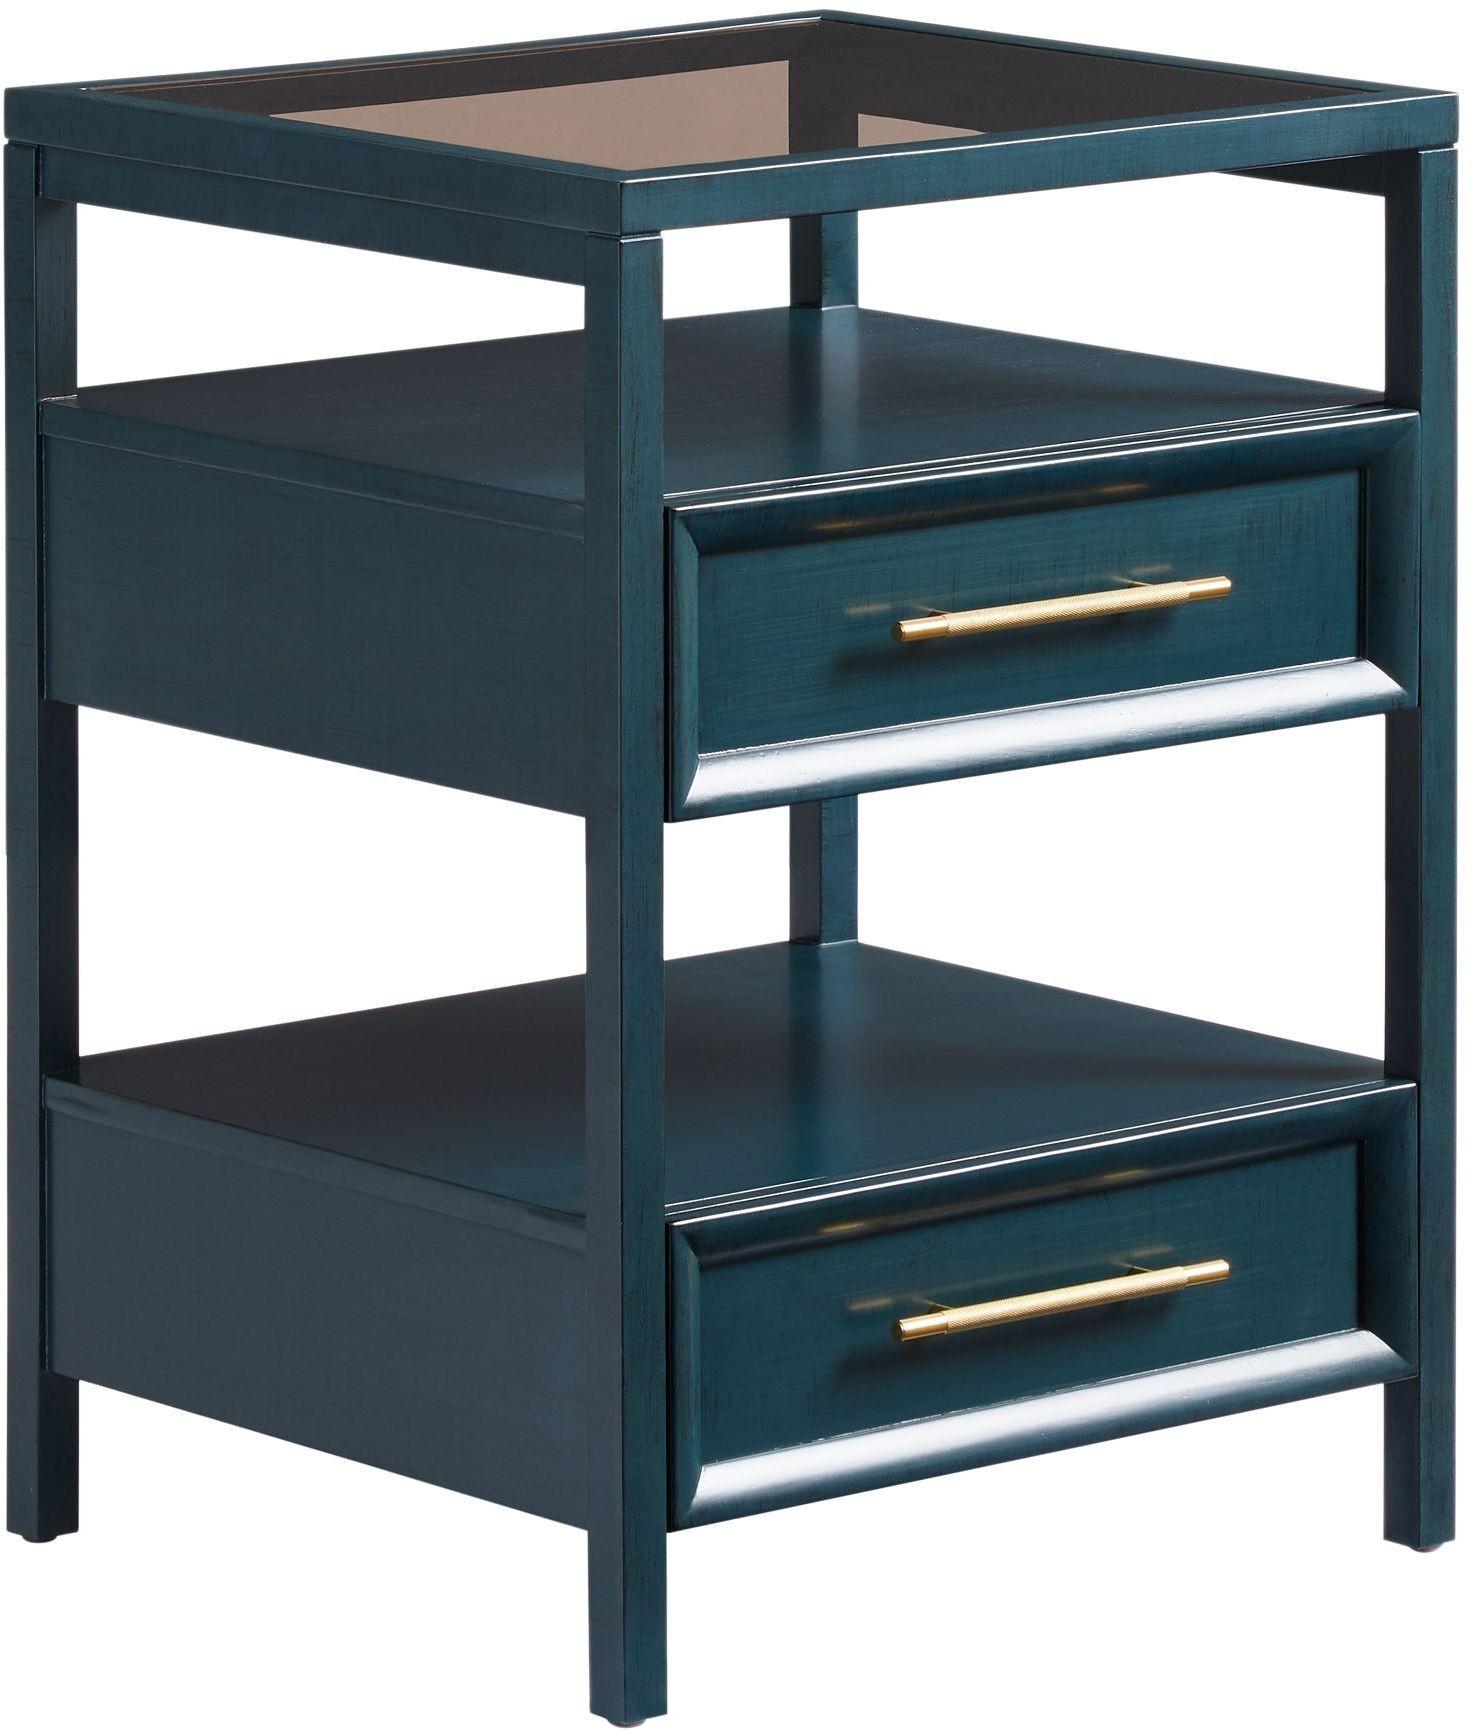 archetype furniture. Panavista Oceanic Archetype Telephone Table Furniture S